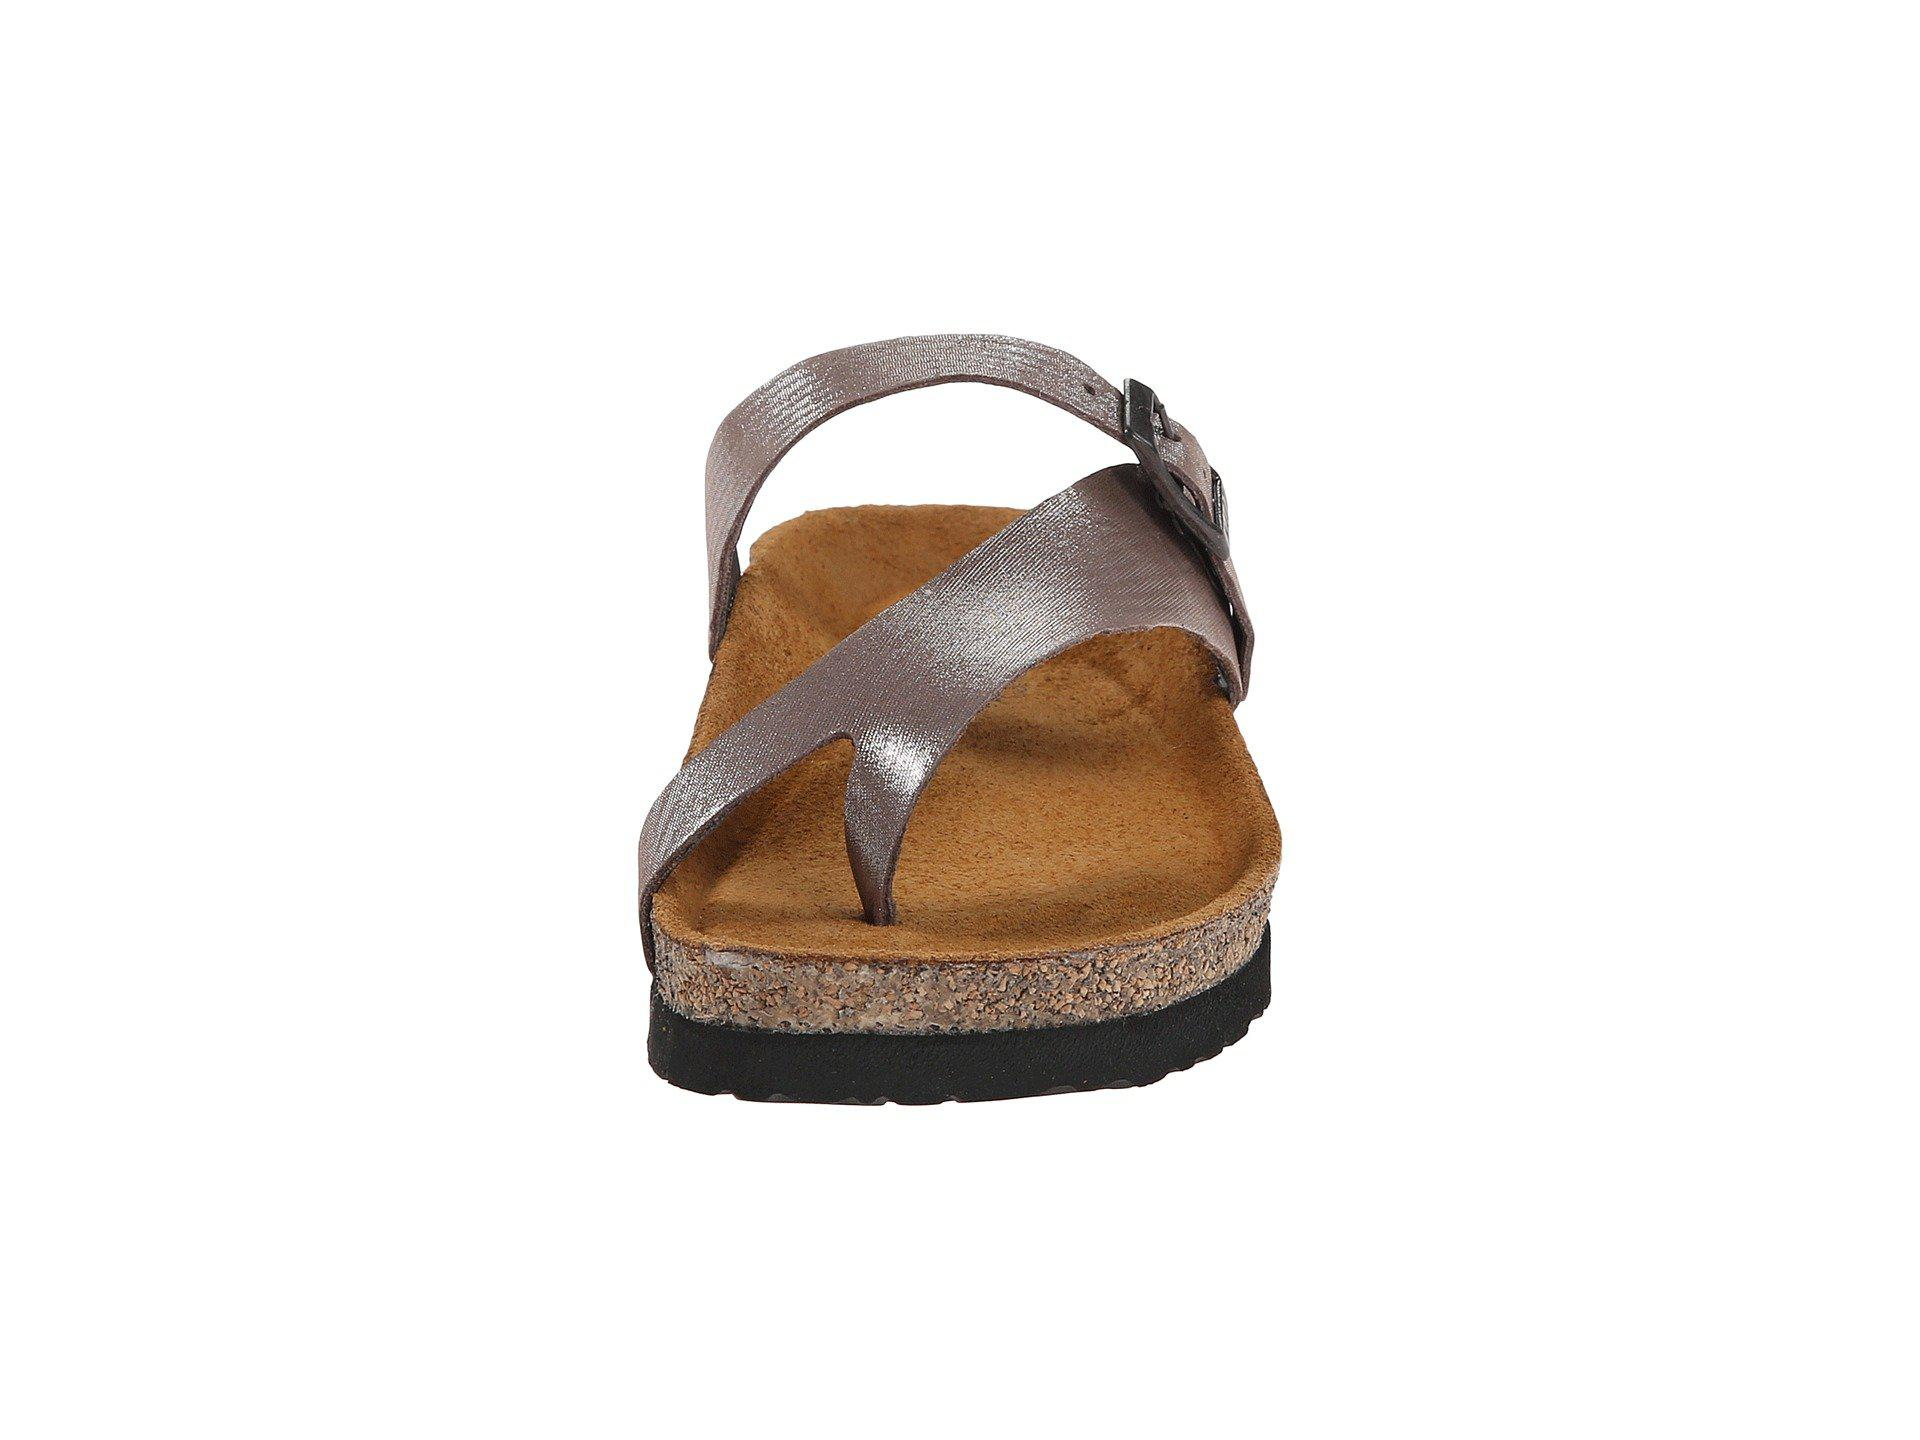 ad0d416d9d01 Naot - Metallic Tahoe (buffalo Leather) Women s Sandals - Lyst. View  fullscreen